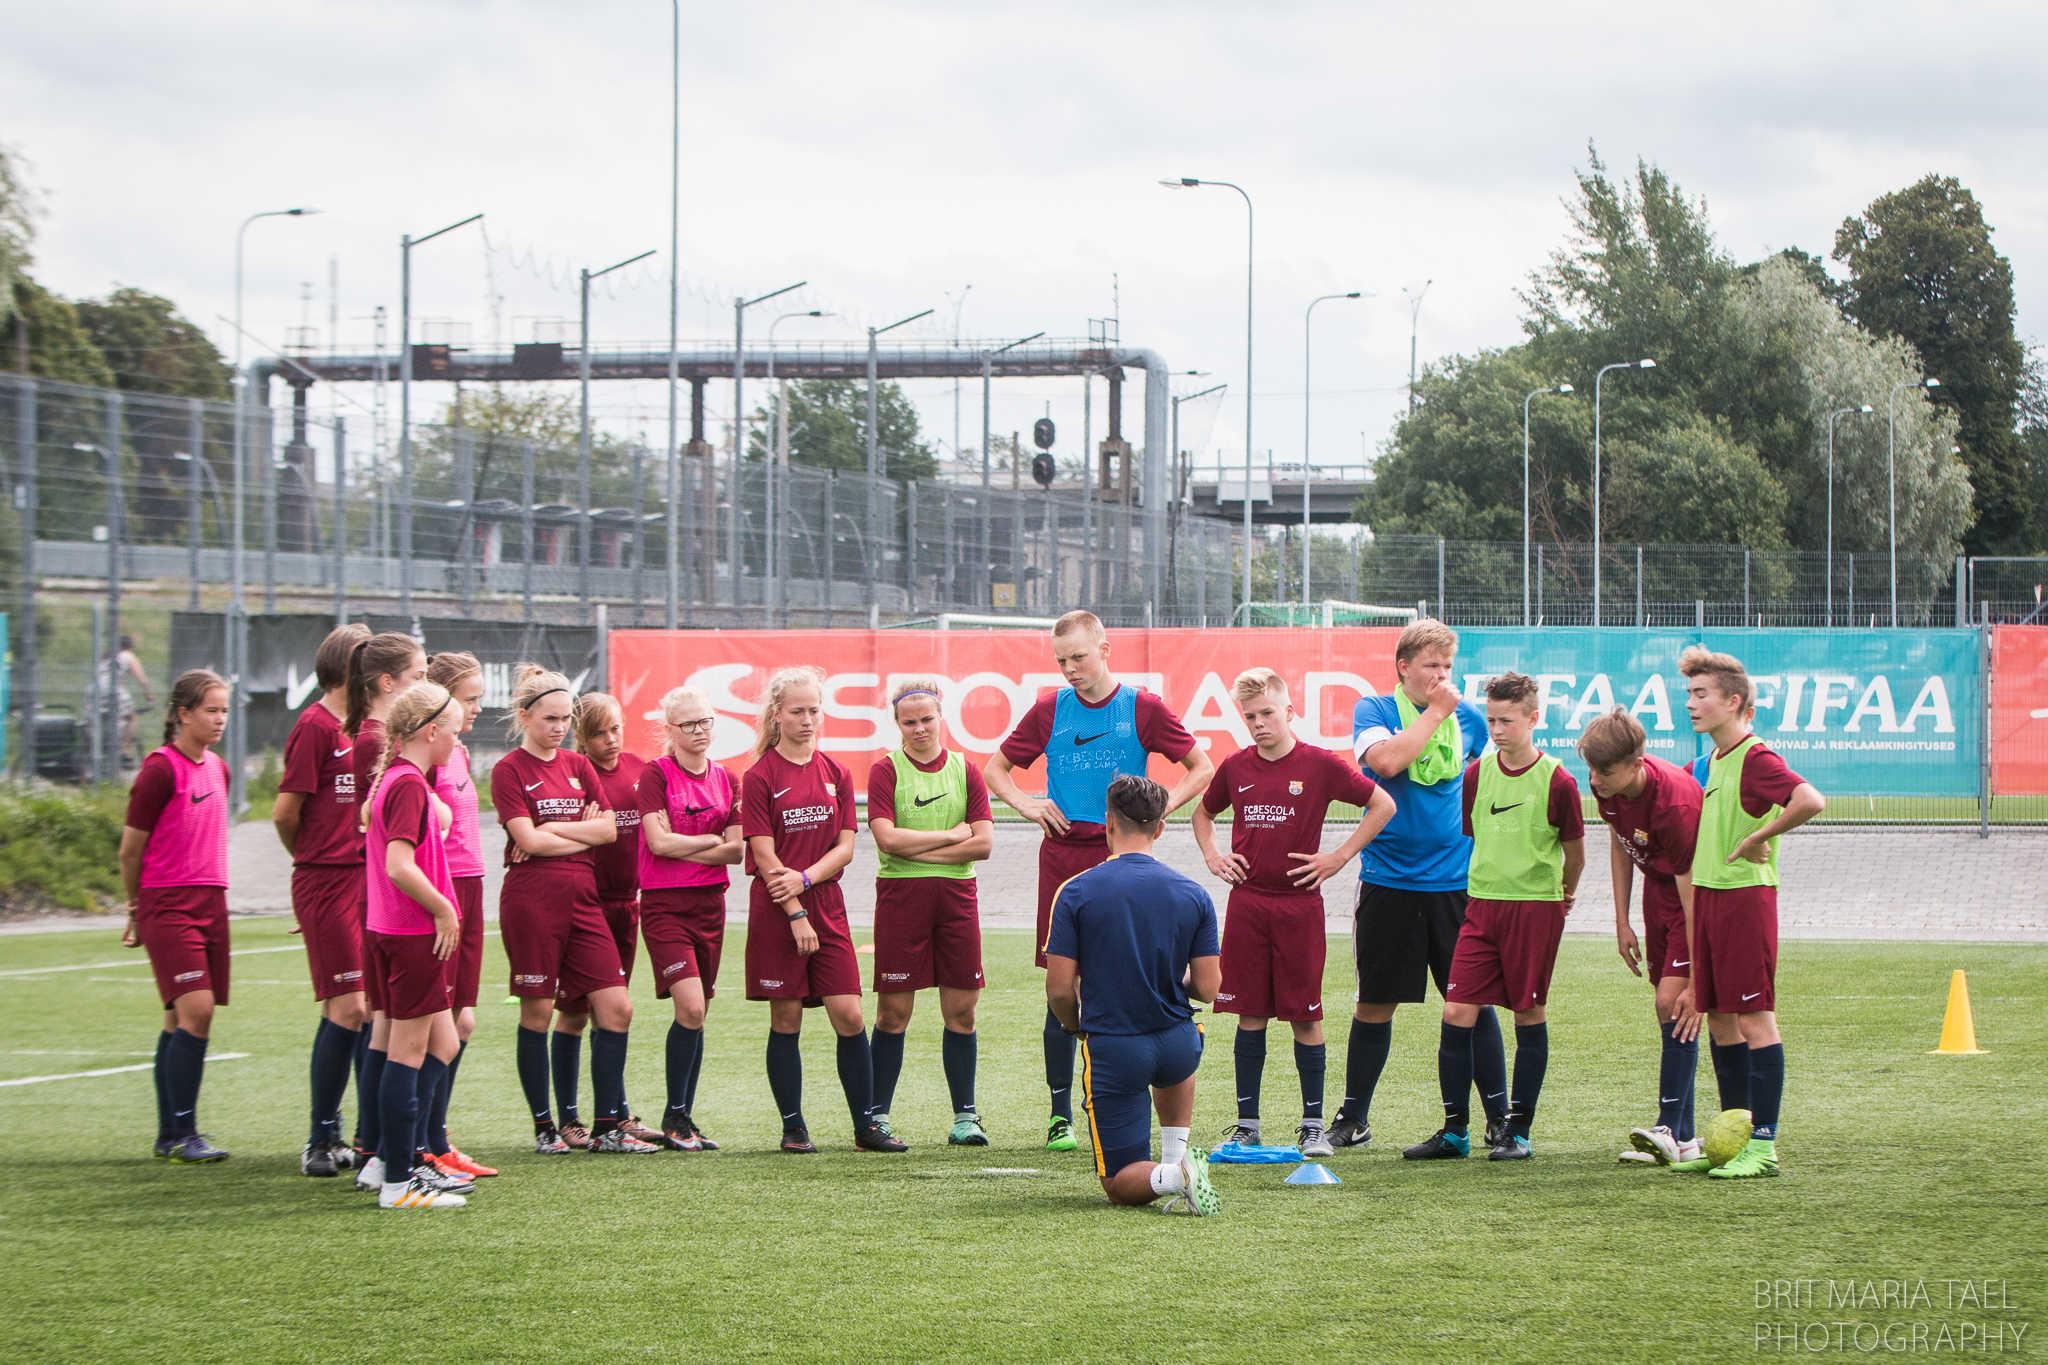 FC Barcelona laager Tallinnas, 11. juuli 2016. Foto: Brit Maria Tael.